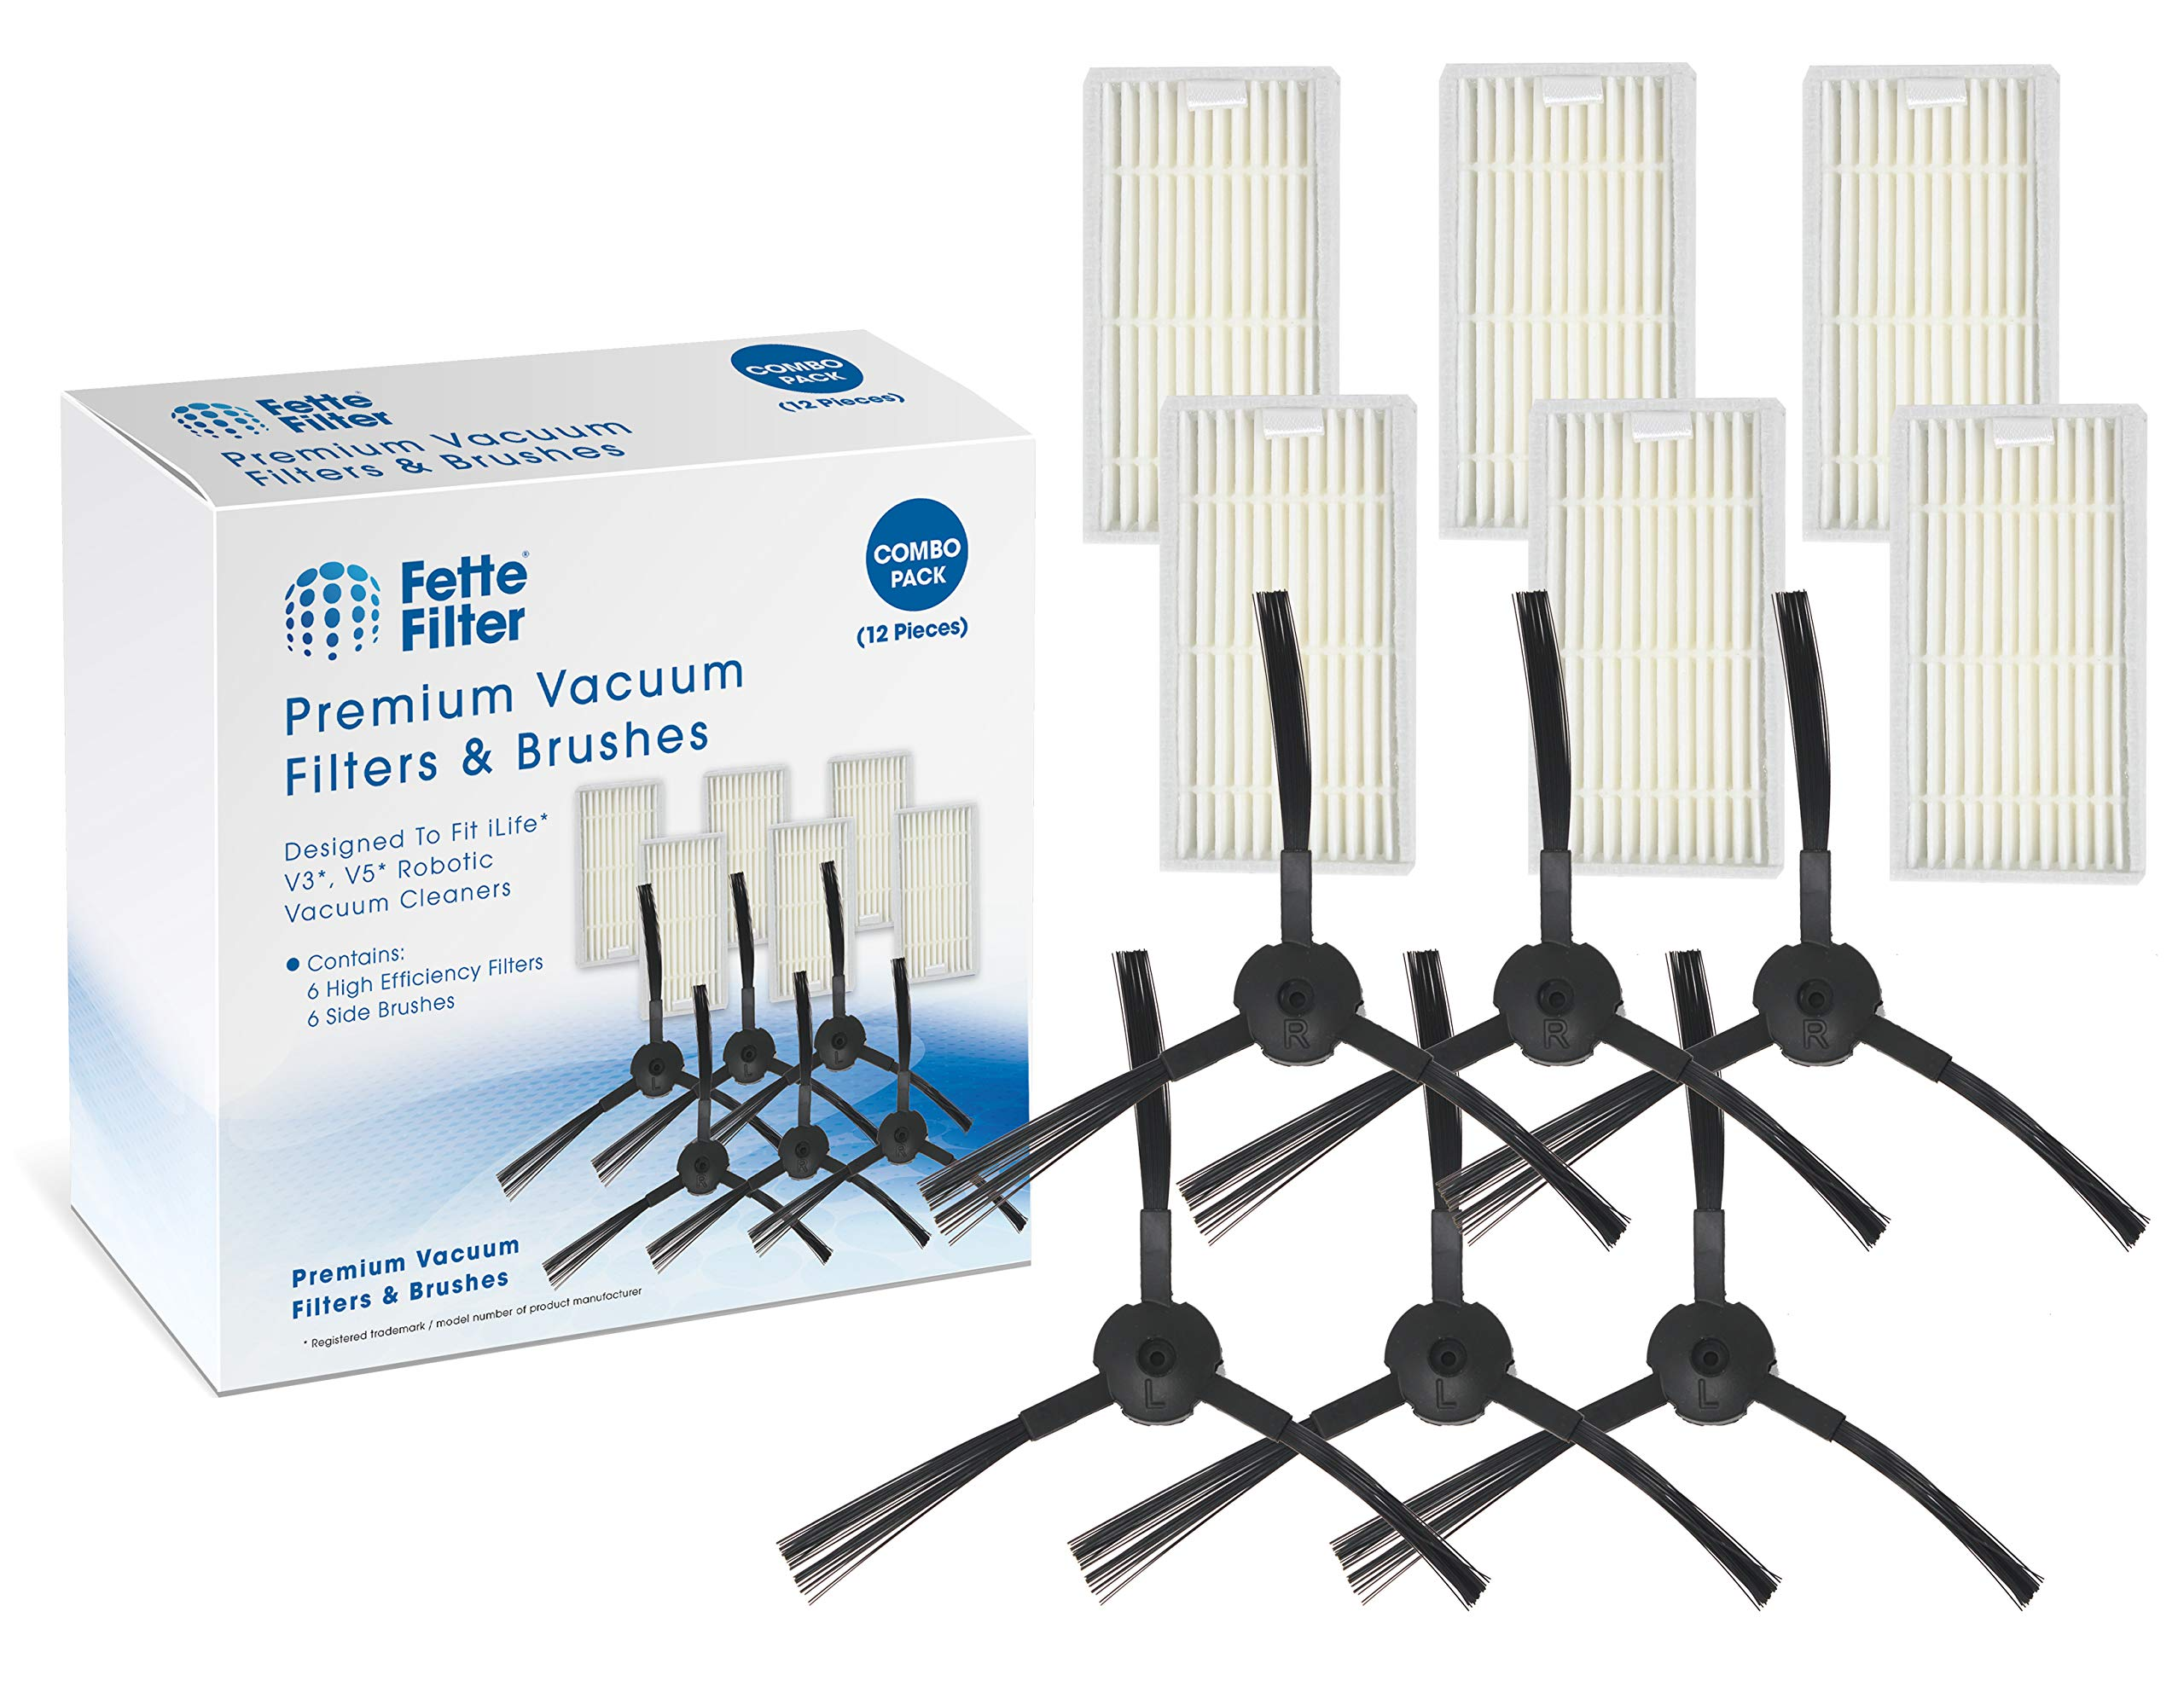 Fette Filter - Robot Vacuum Cleaner Filter & Side Brush Kit for V3 V3s V5 V5s Compatible for ILIFE. (Packs of 6)